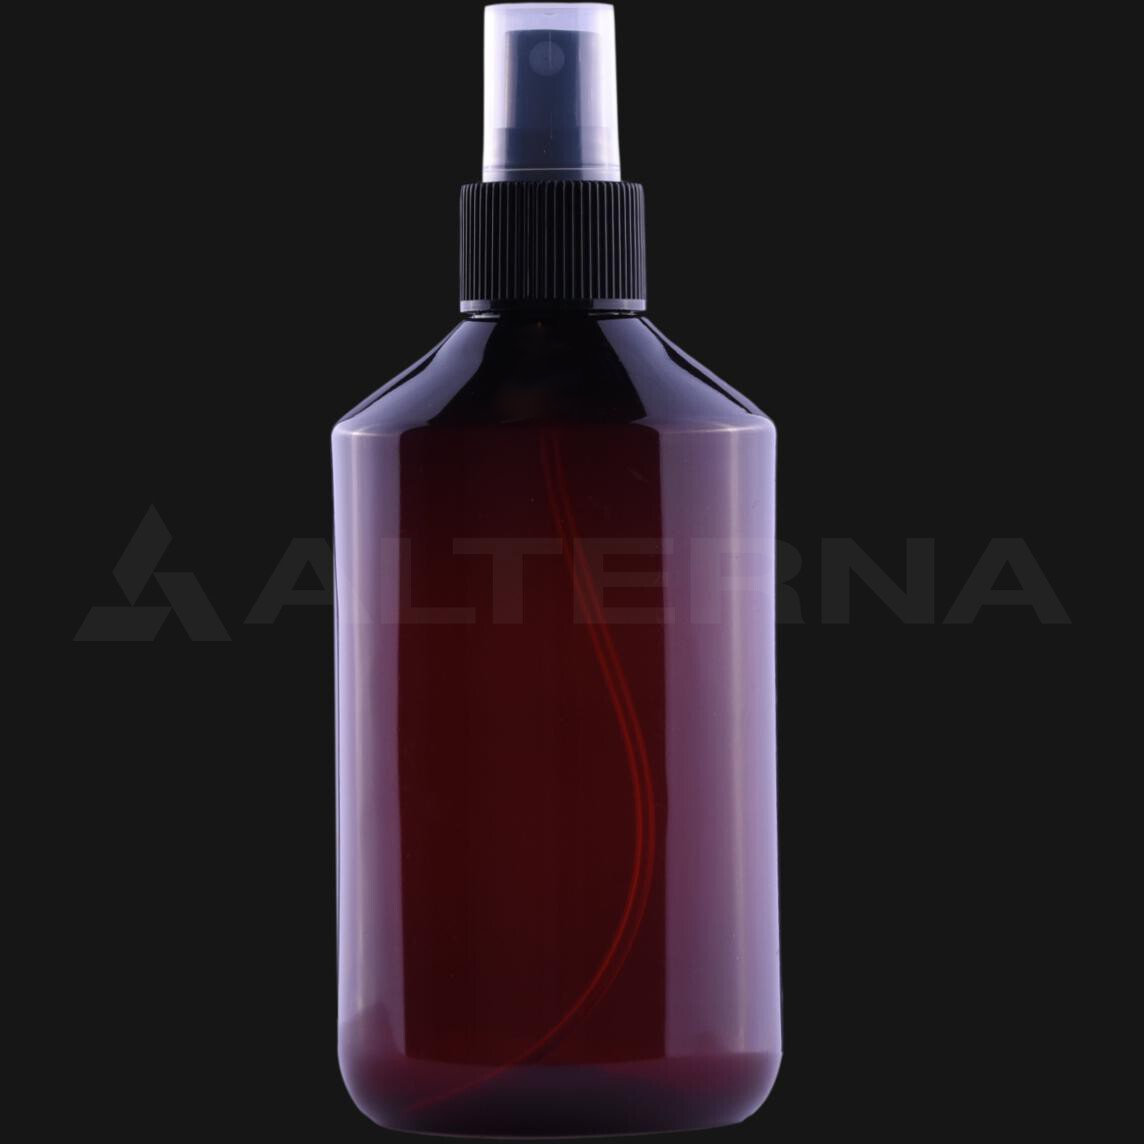 300 ml PET Bottle with 24 mm Sprayer